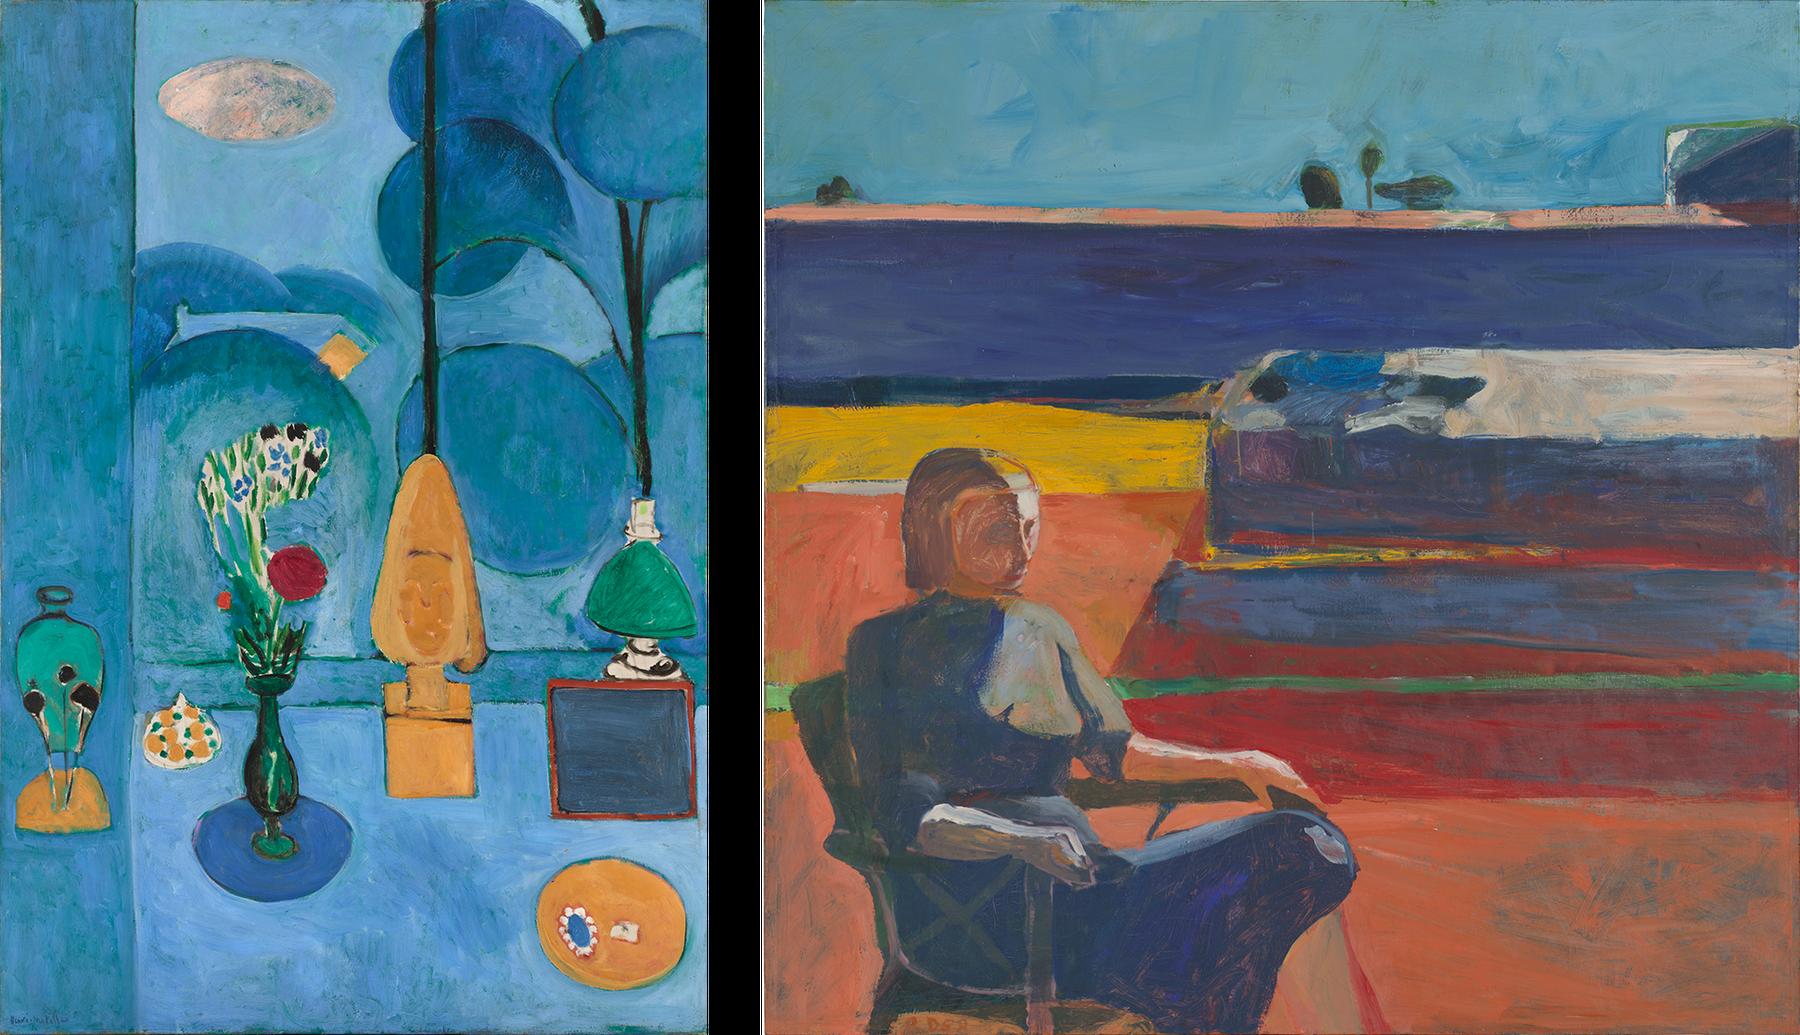 Left: Henri Matisse  The Blue Window, 1913. Right: Richard Diebenkorn  Woman on a Porch, 19587